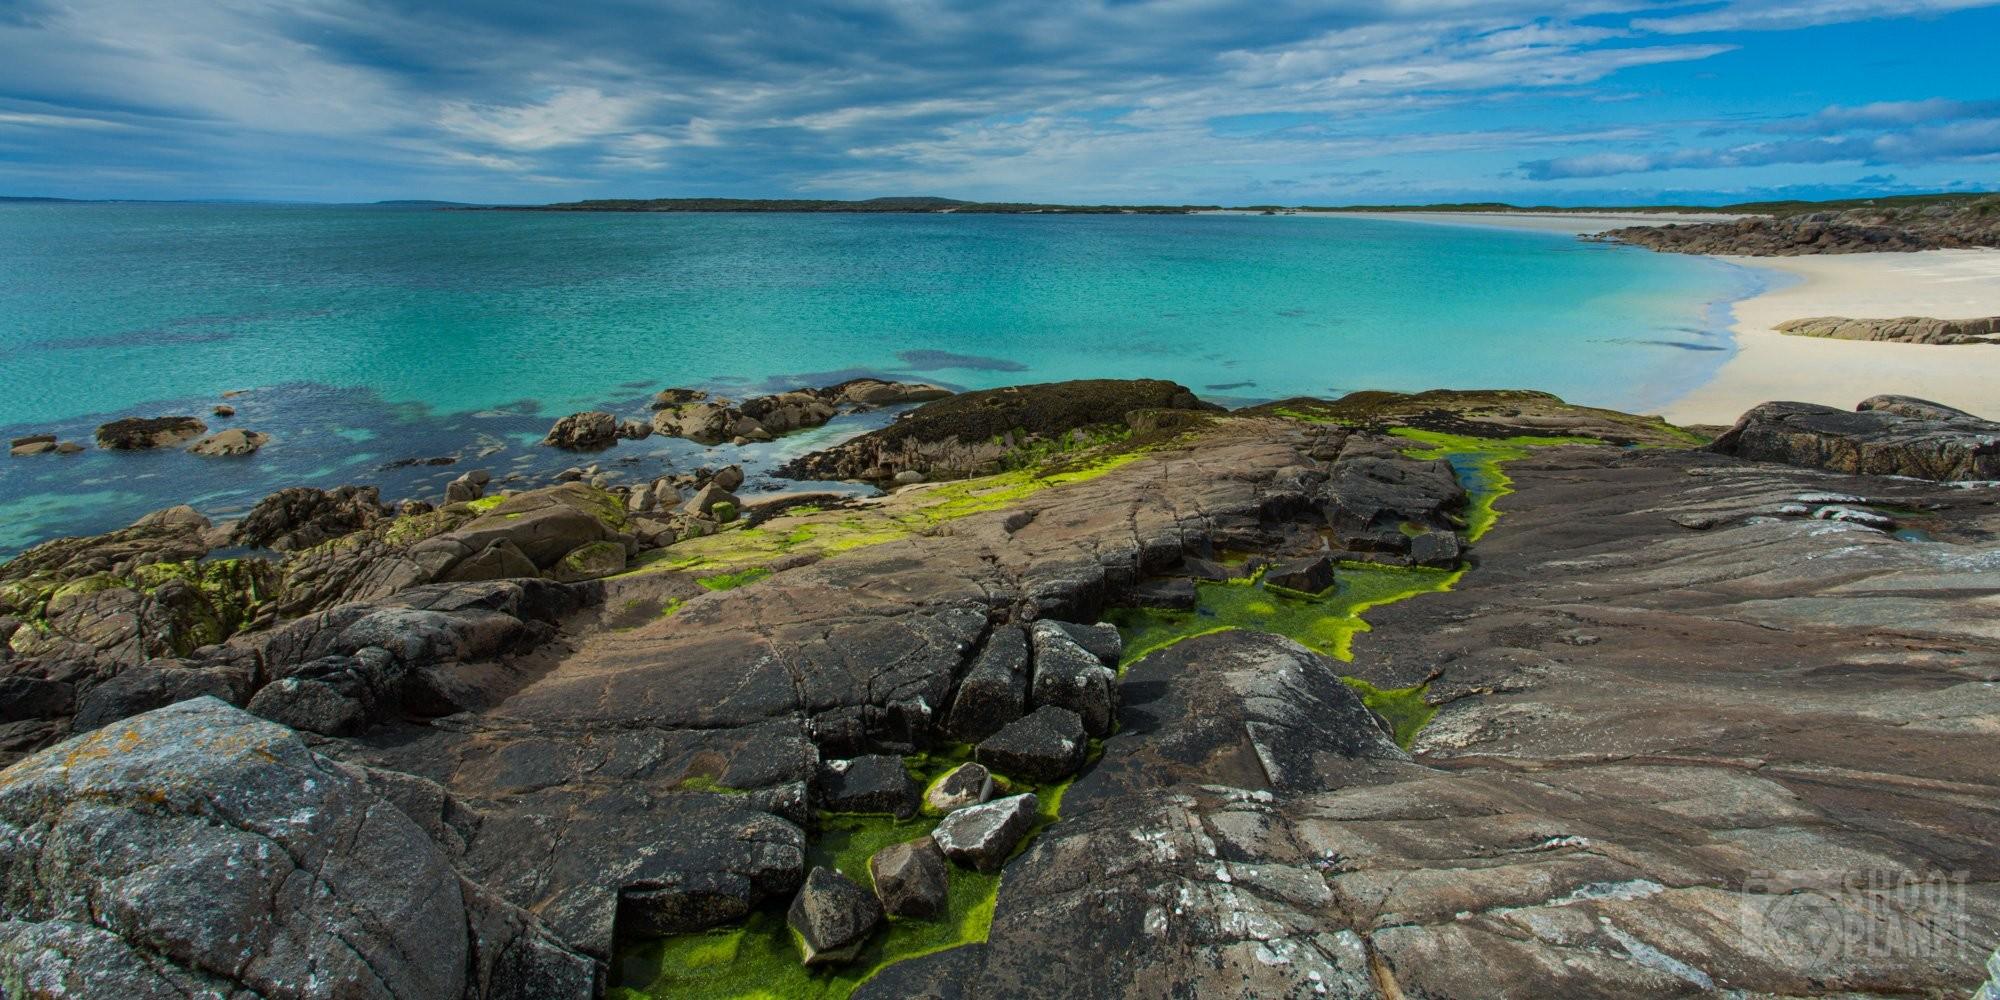 Gurteen Beach and Dog's Bay beach, Ireland